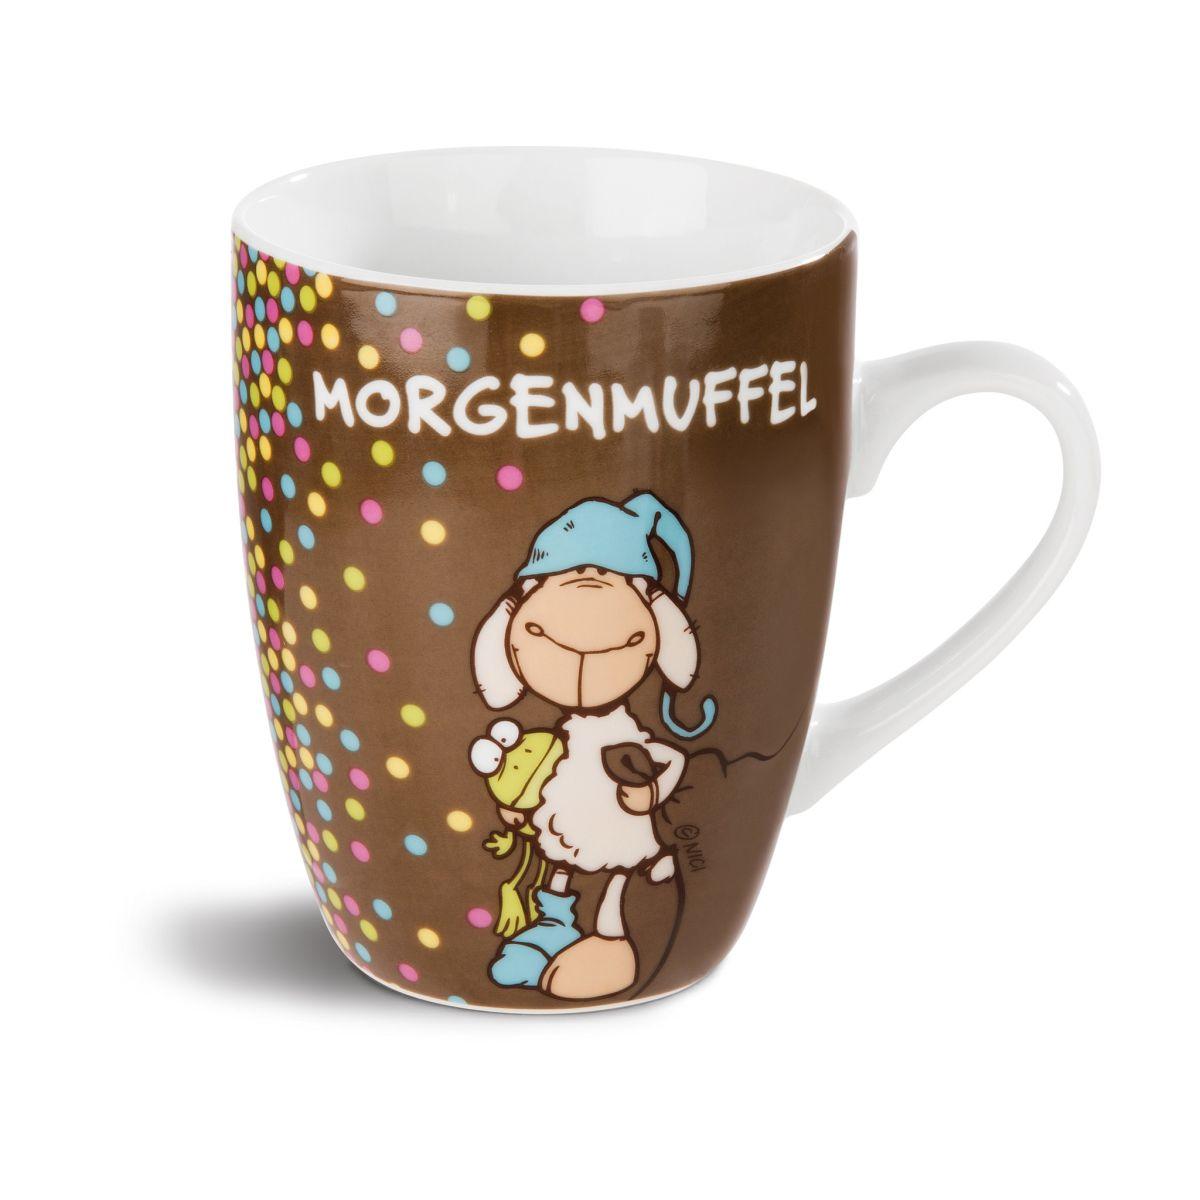 Nici Tassen Xxl : Nici tasse quot morgenmuffel